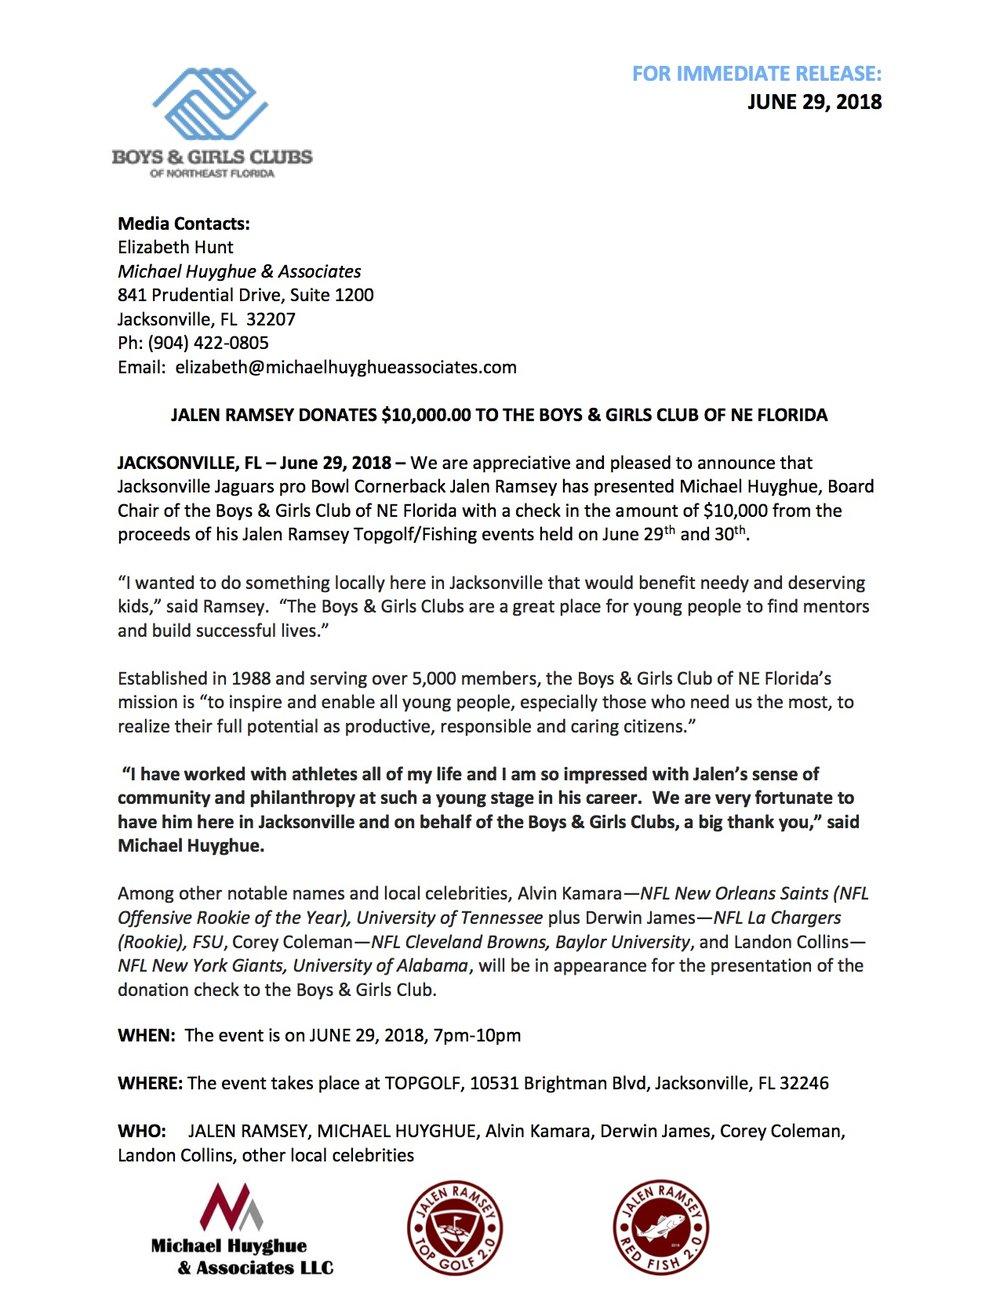 Press Release-Jalen Ramsey $10k check to Boys & Girls Club.jpg